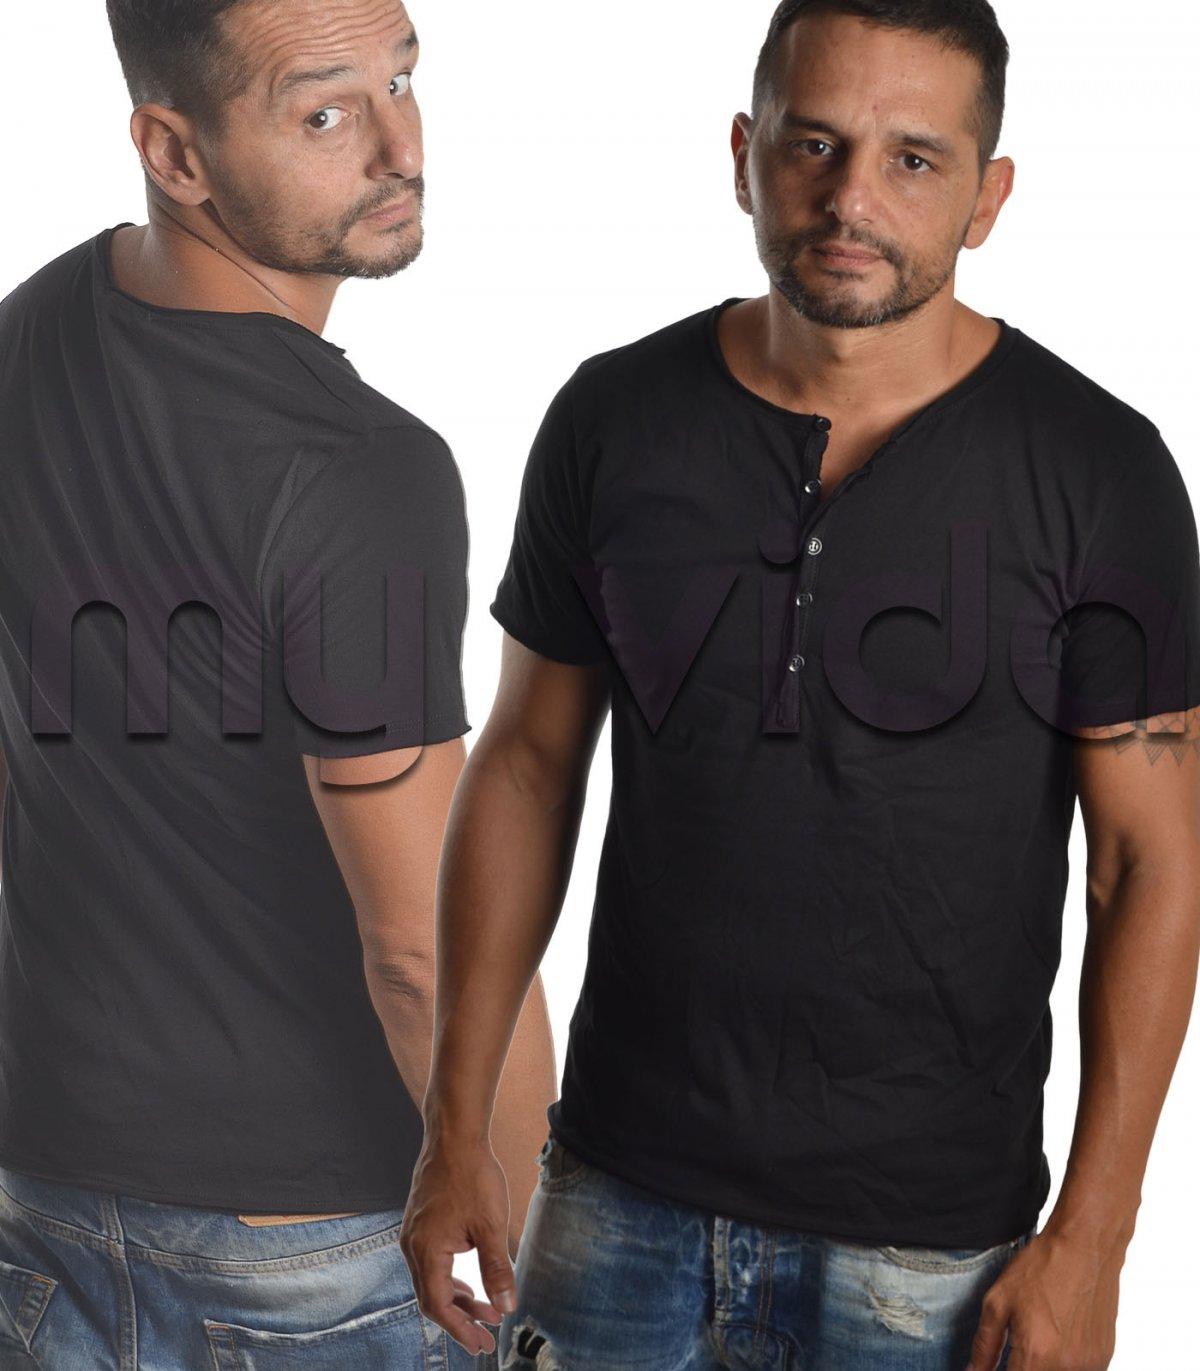 Maglietta Uomo Maglia Vida T BottoniMy Shirt ED9eHIbW2Y